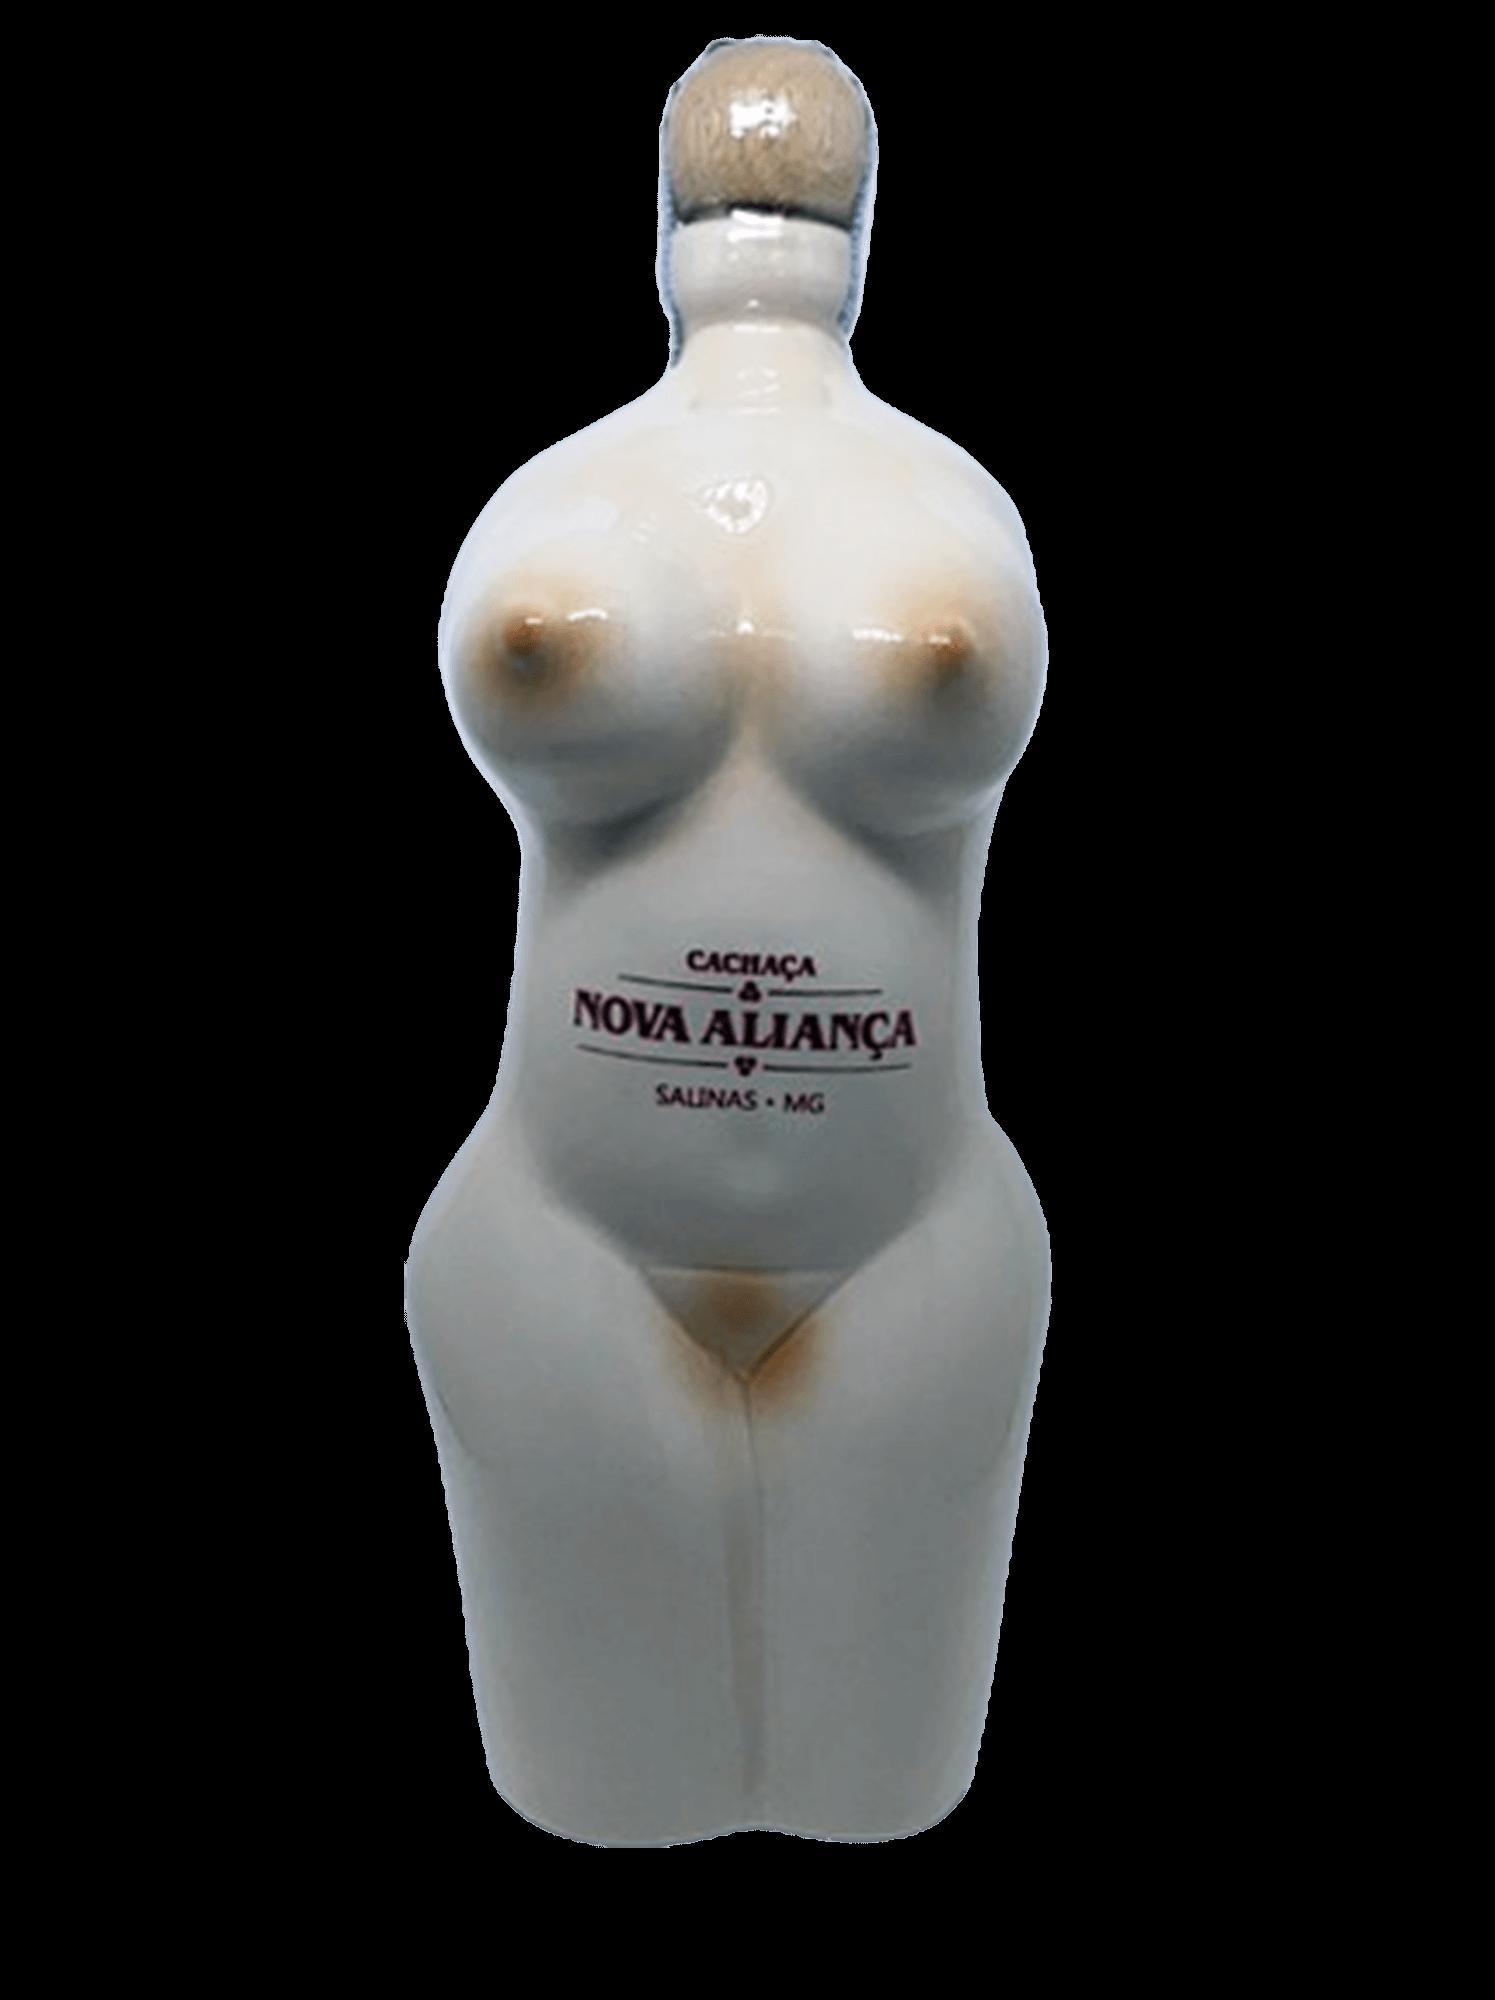 Cachaça Nova Aliança Porcelana Corpo Mulher